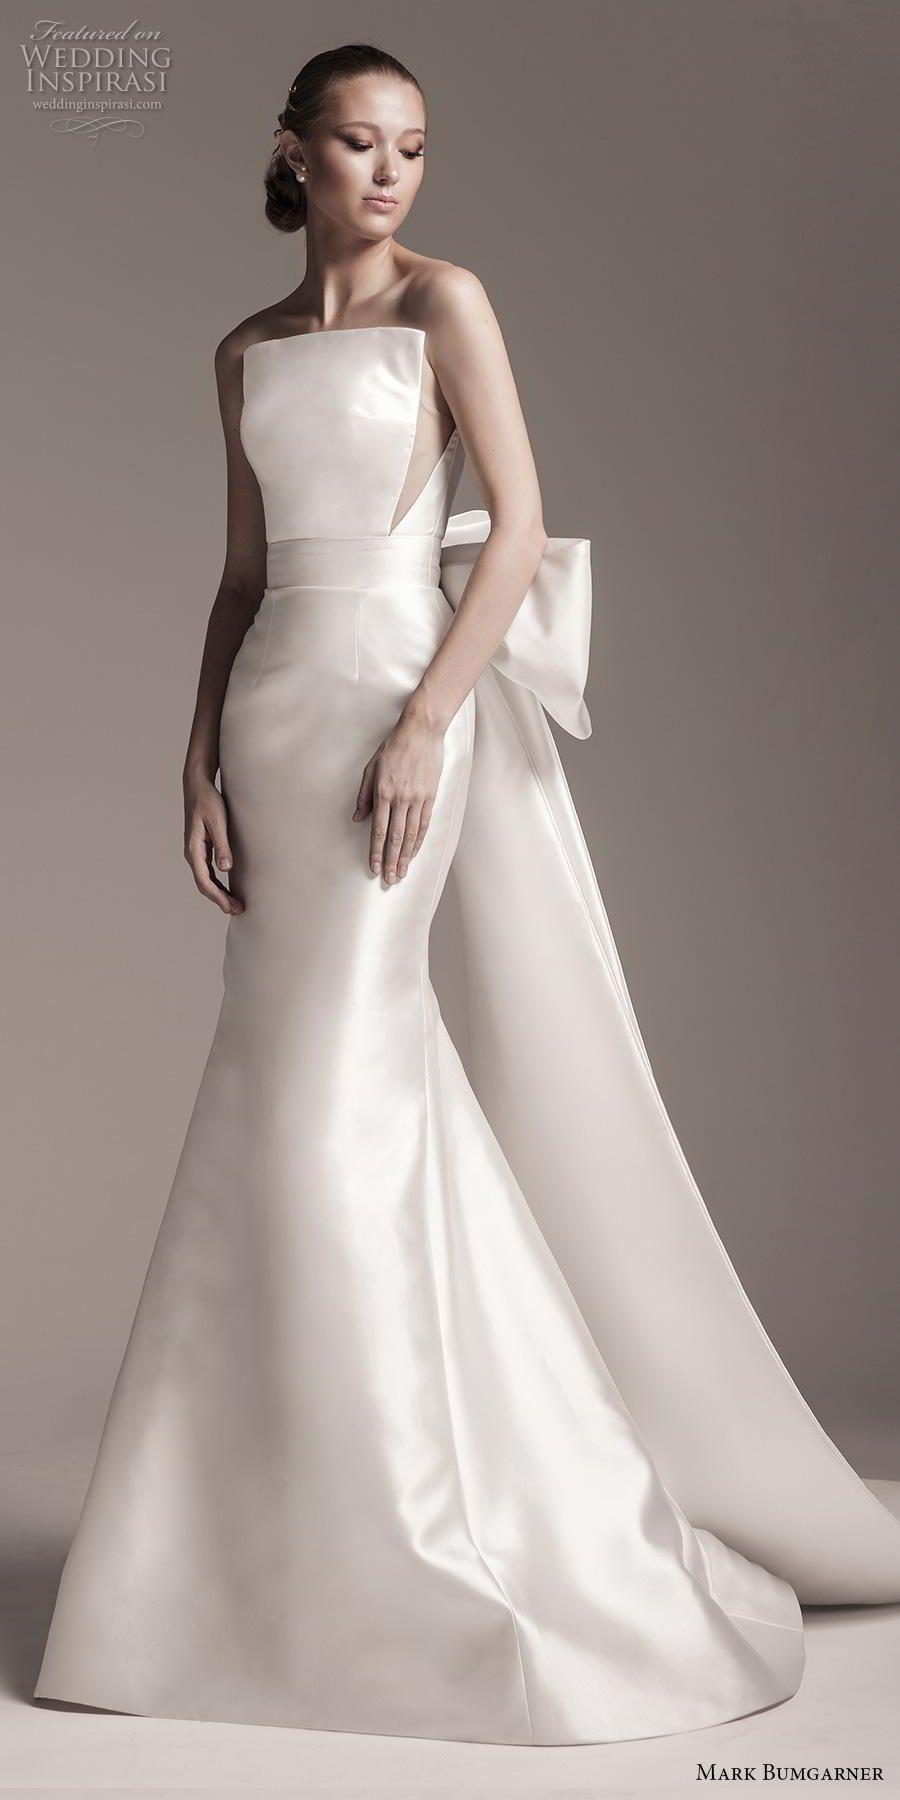 Ridiculous wedding dresses  Mark Bumgarner Fall  Wedding Dresses  wedding  Pinterest